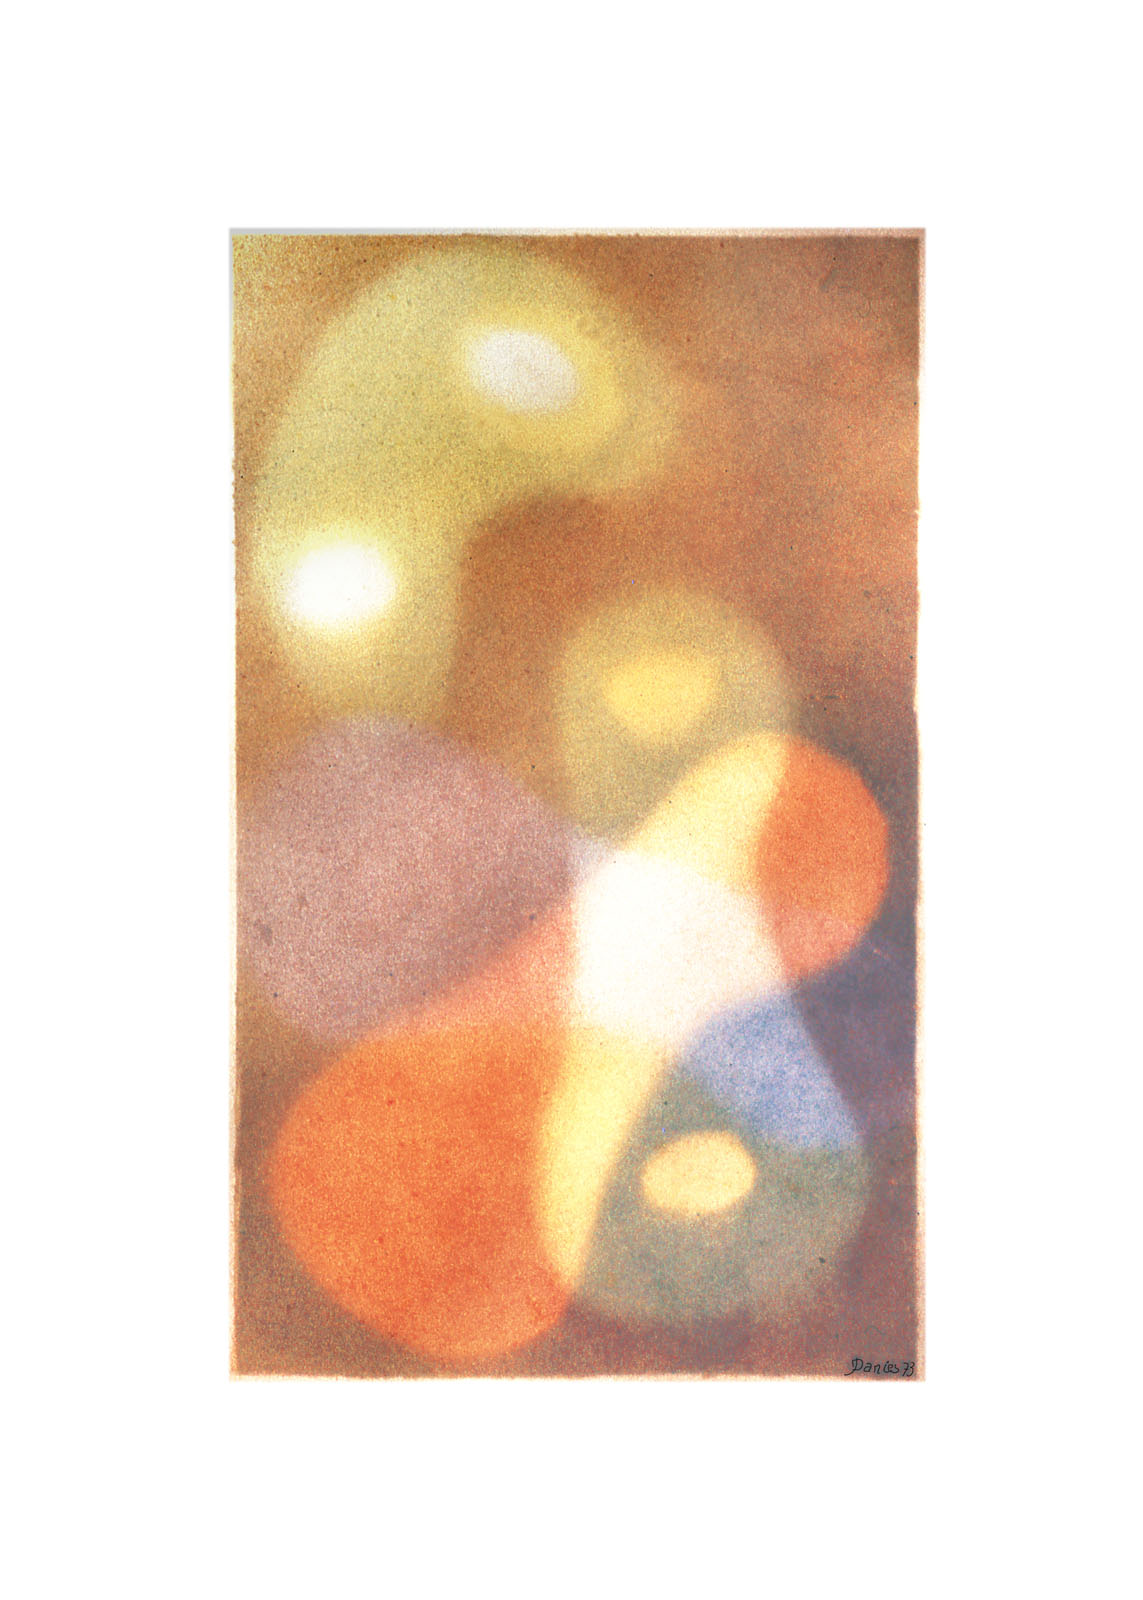 panies-danielvillalobos-spanish-painting-abstract-23